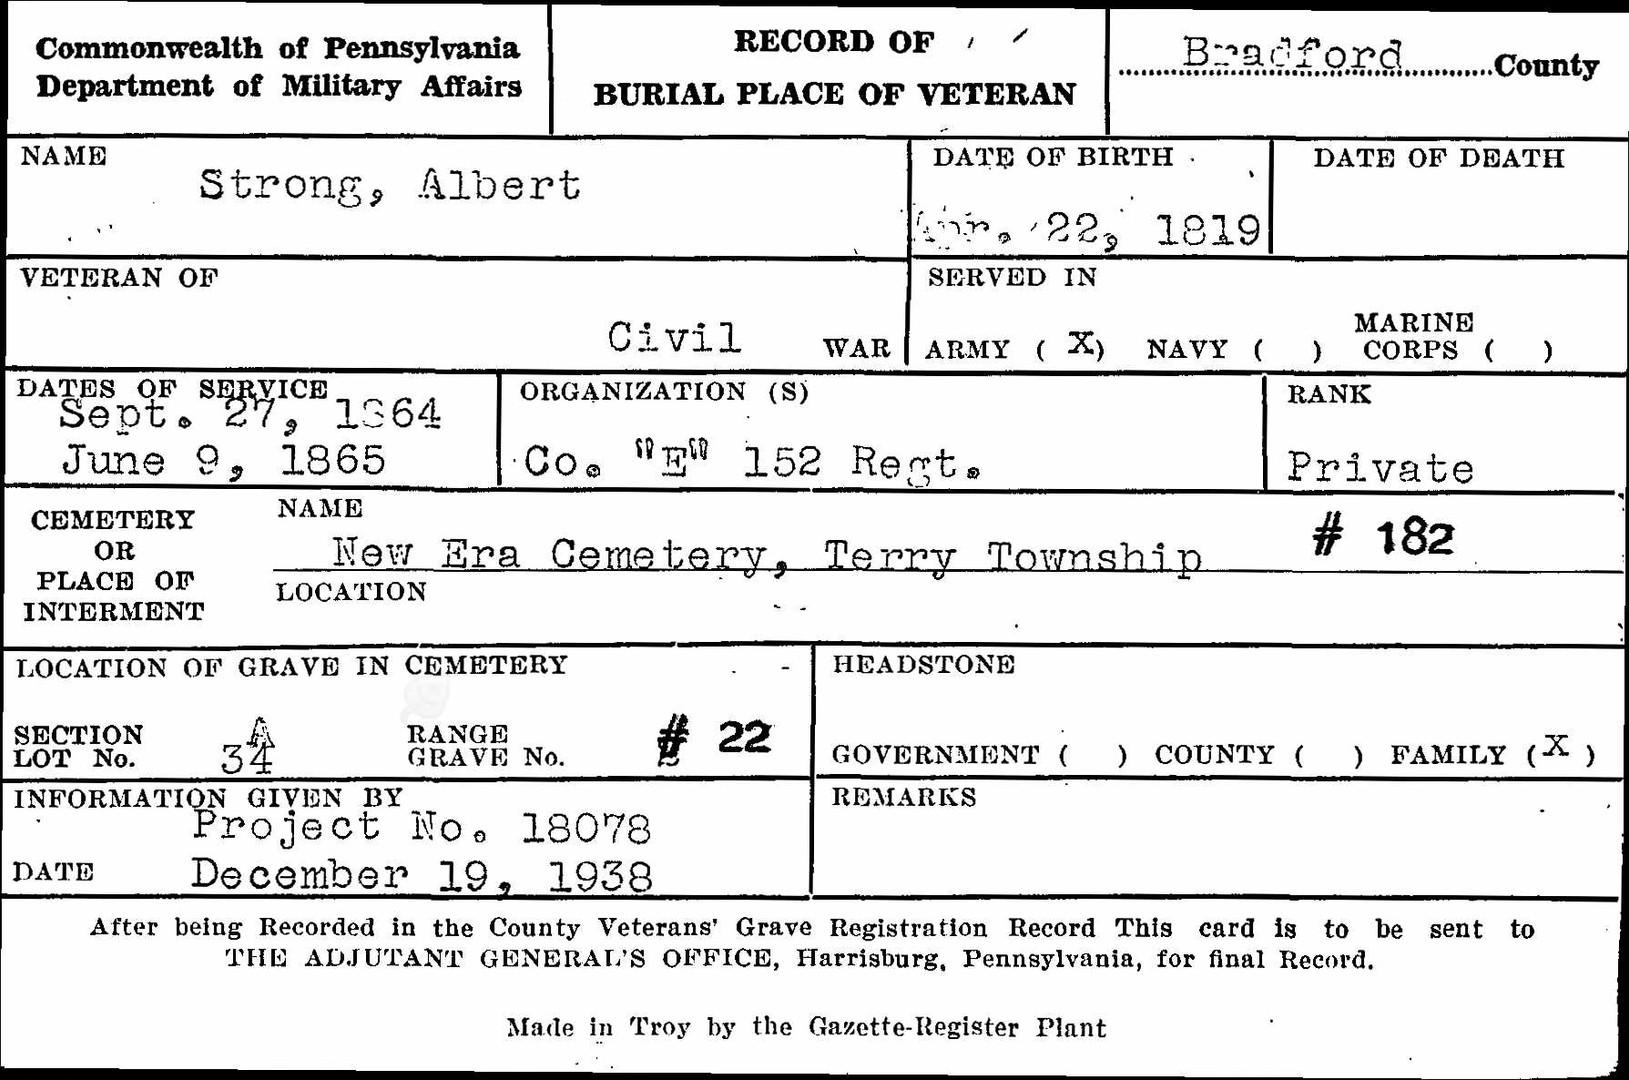 Albert Strong burial card